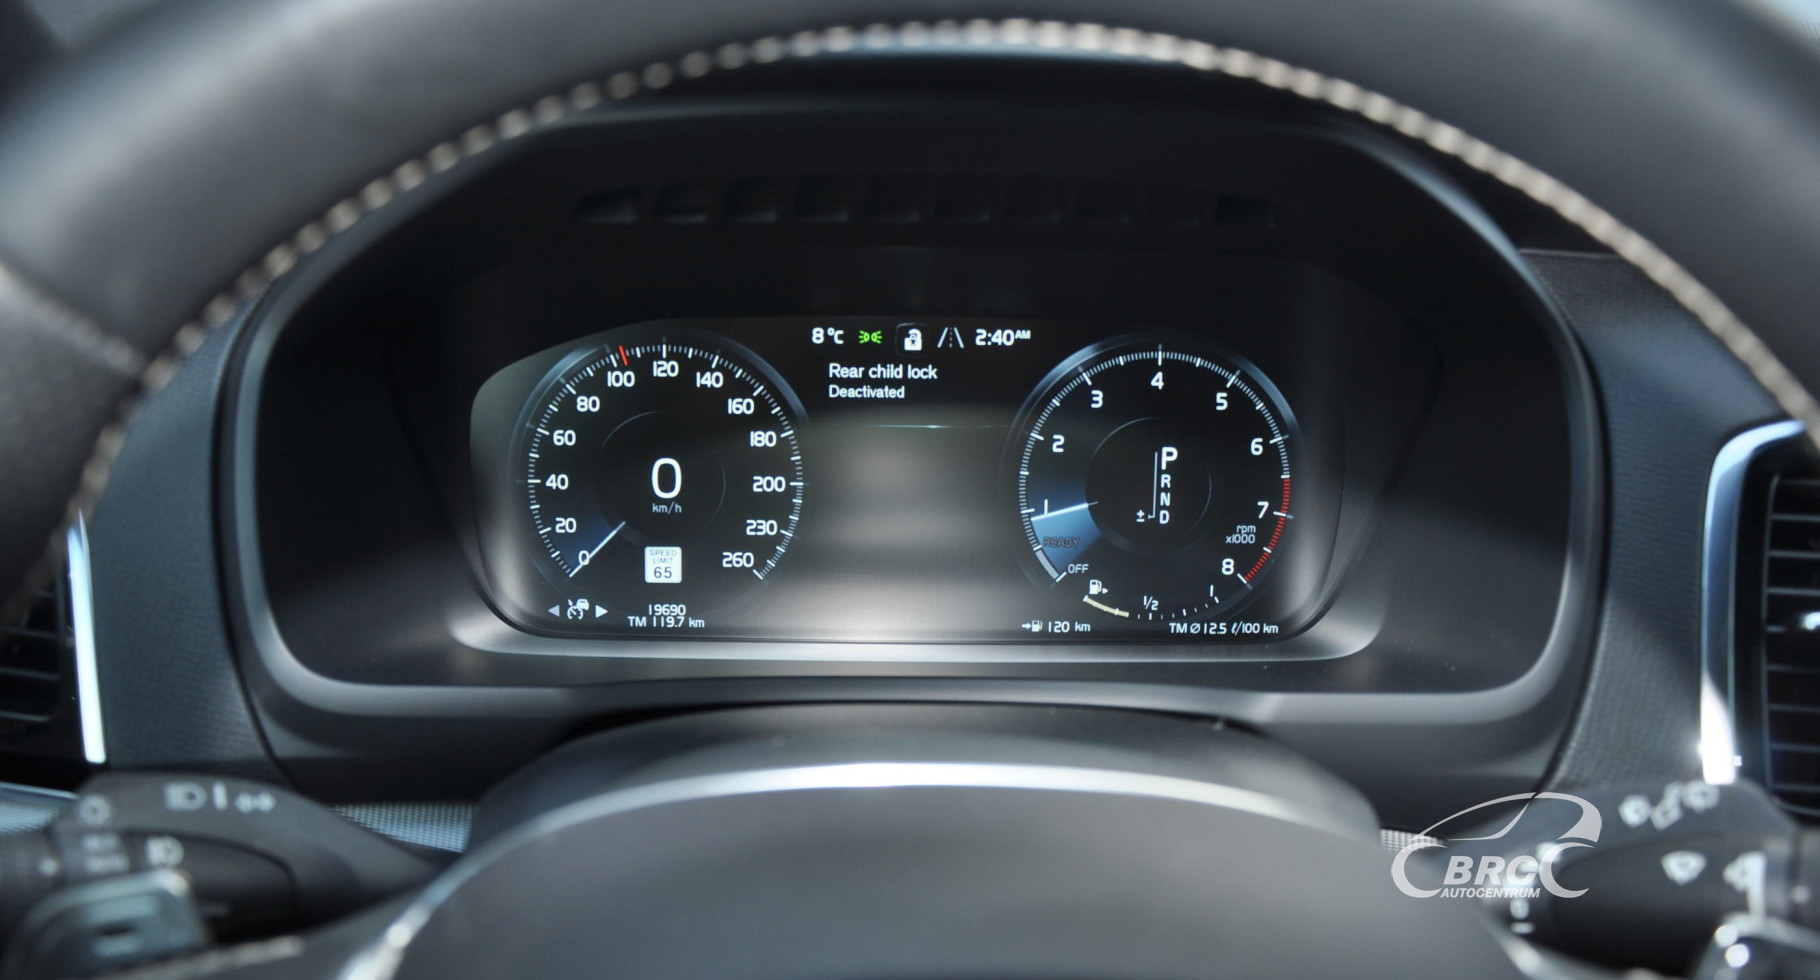 Volvo XC 90 2.0 T5 R-Design AWD Automatas